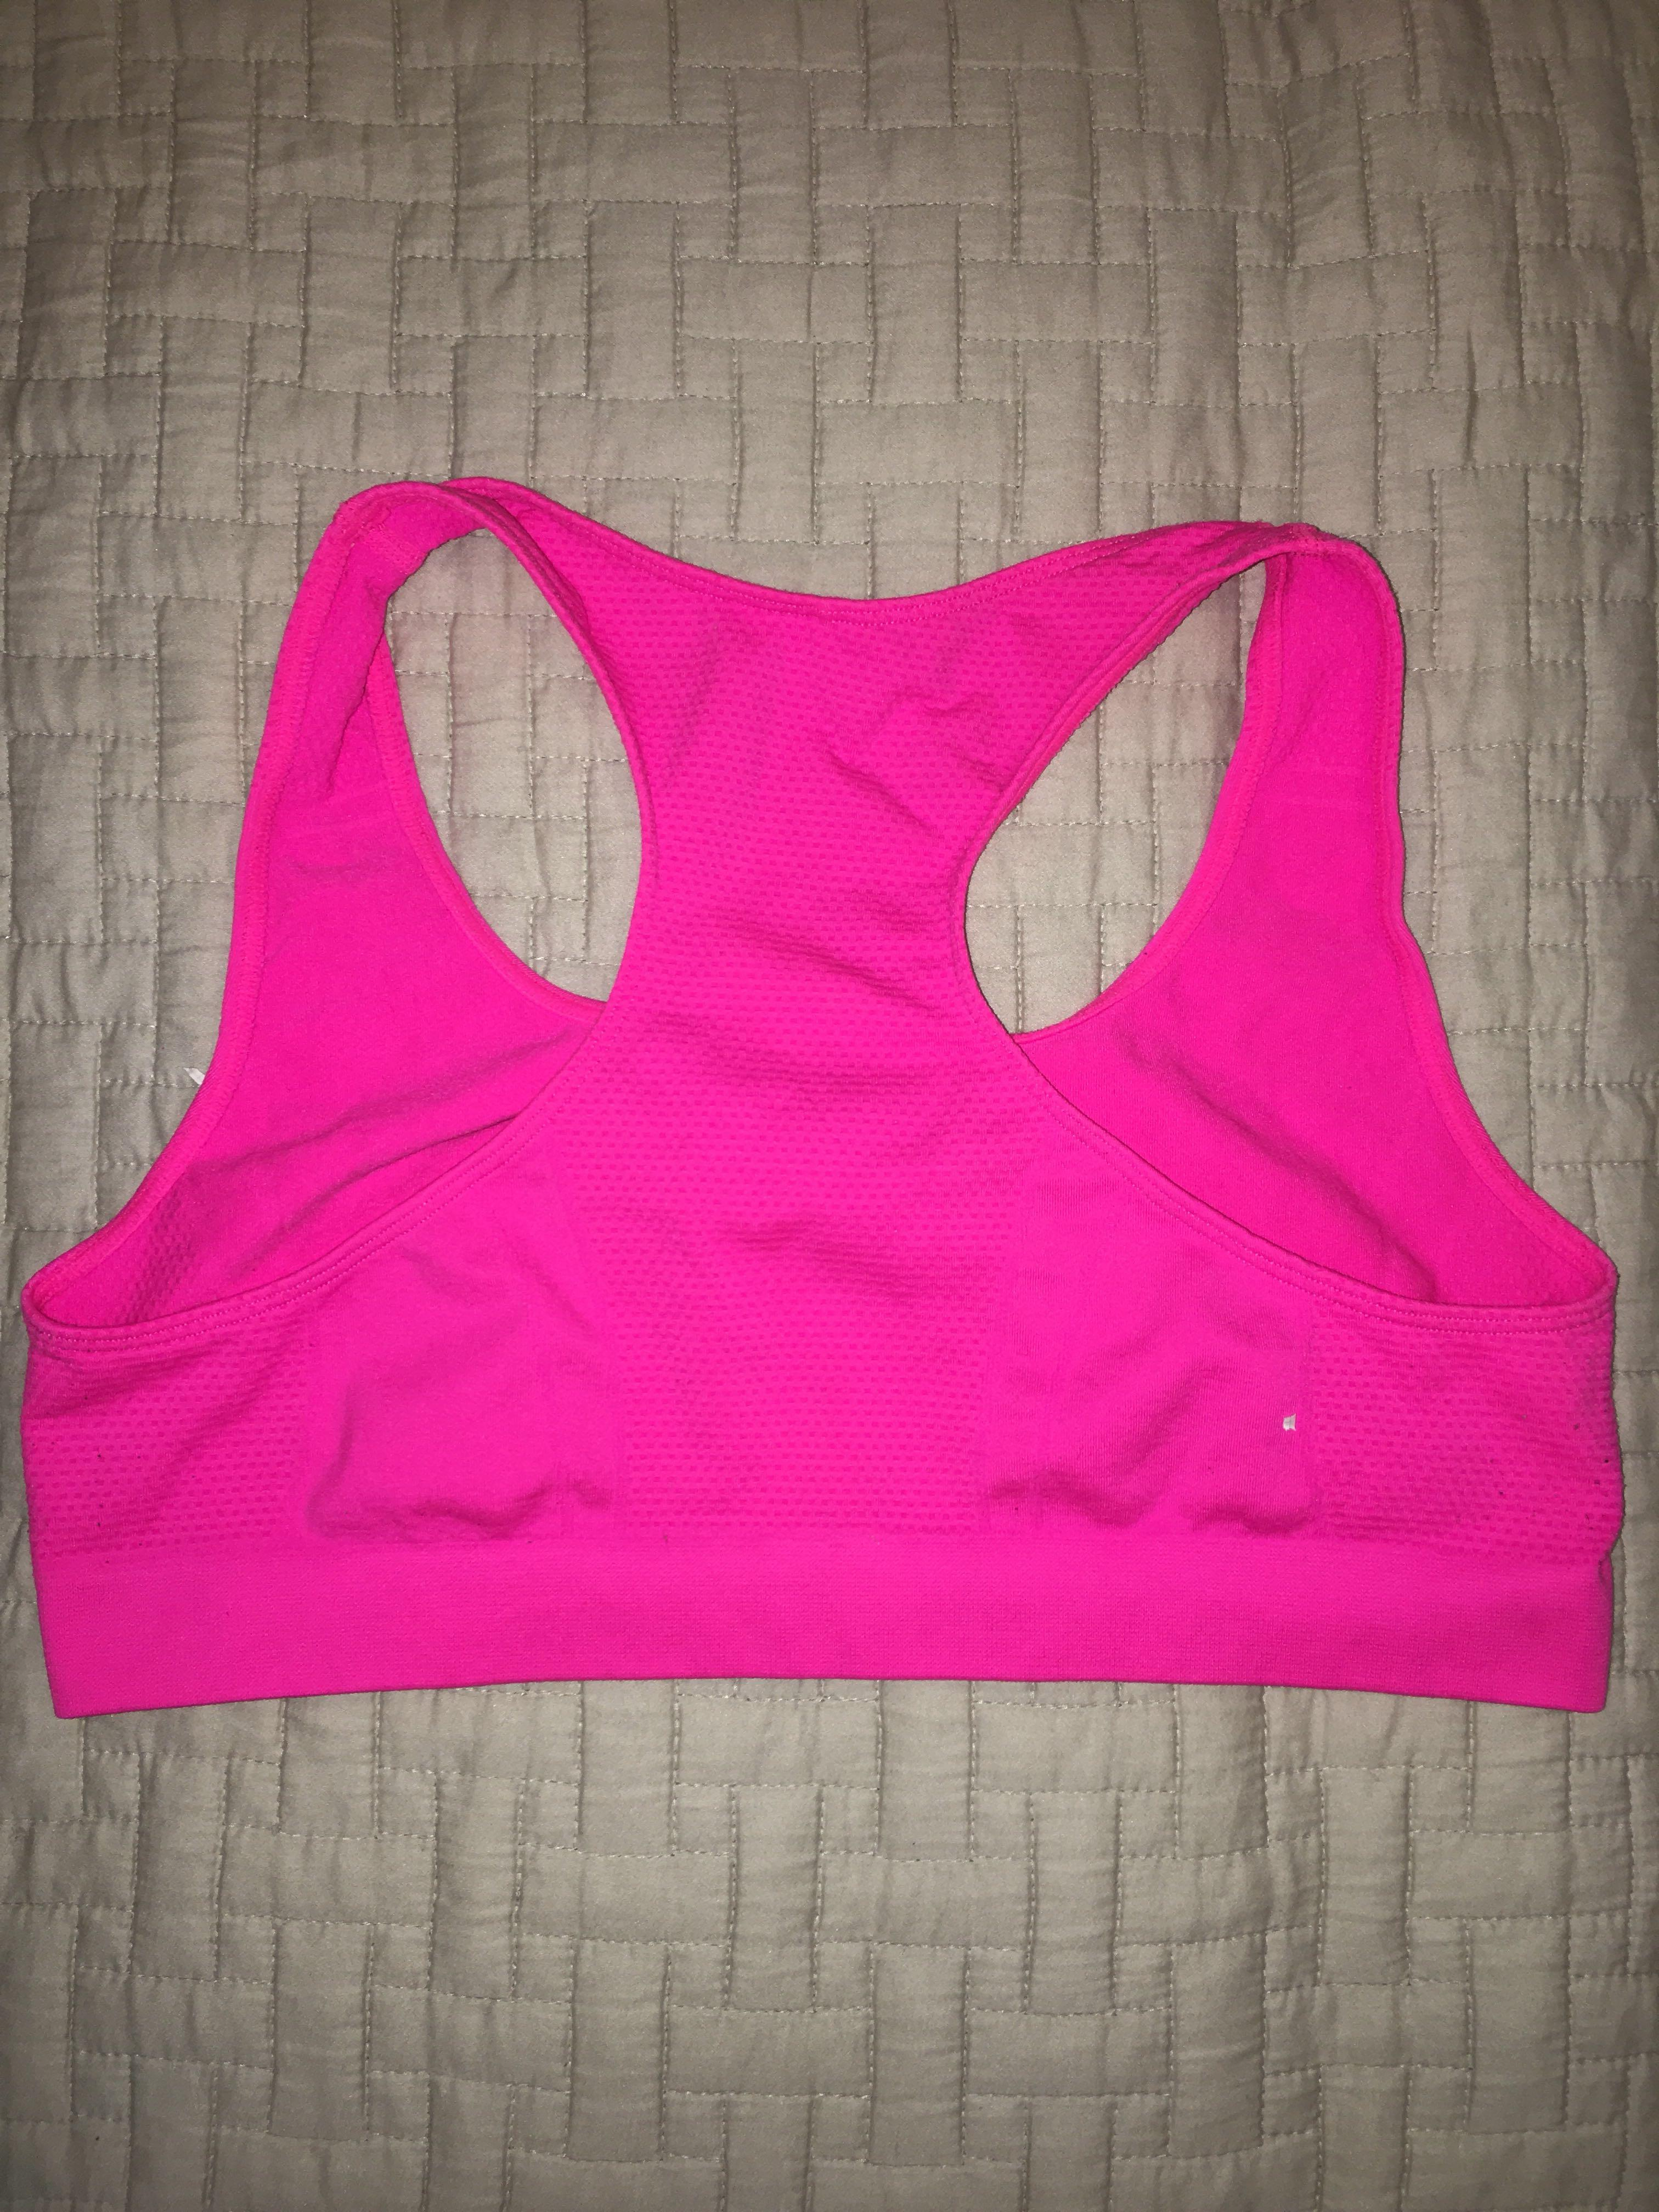 neon pink sports bra